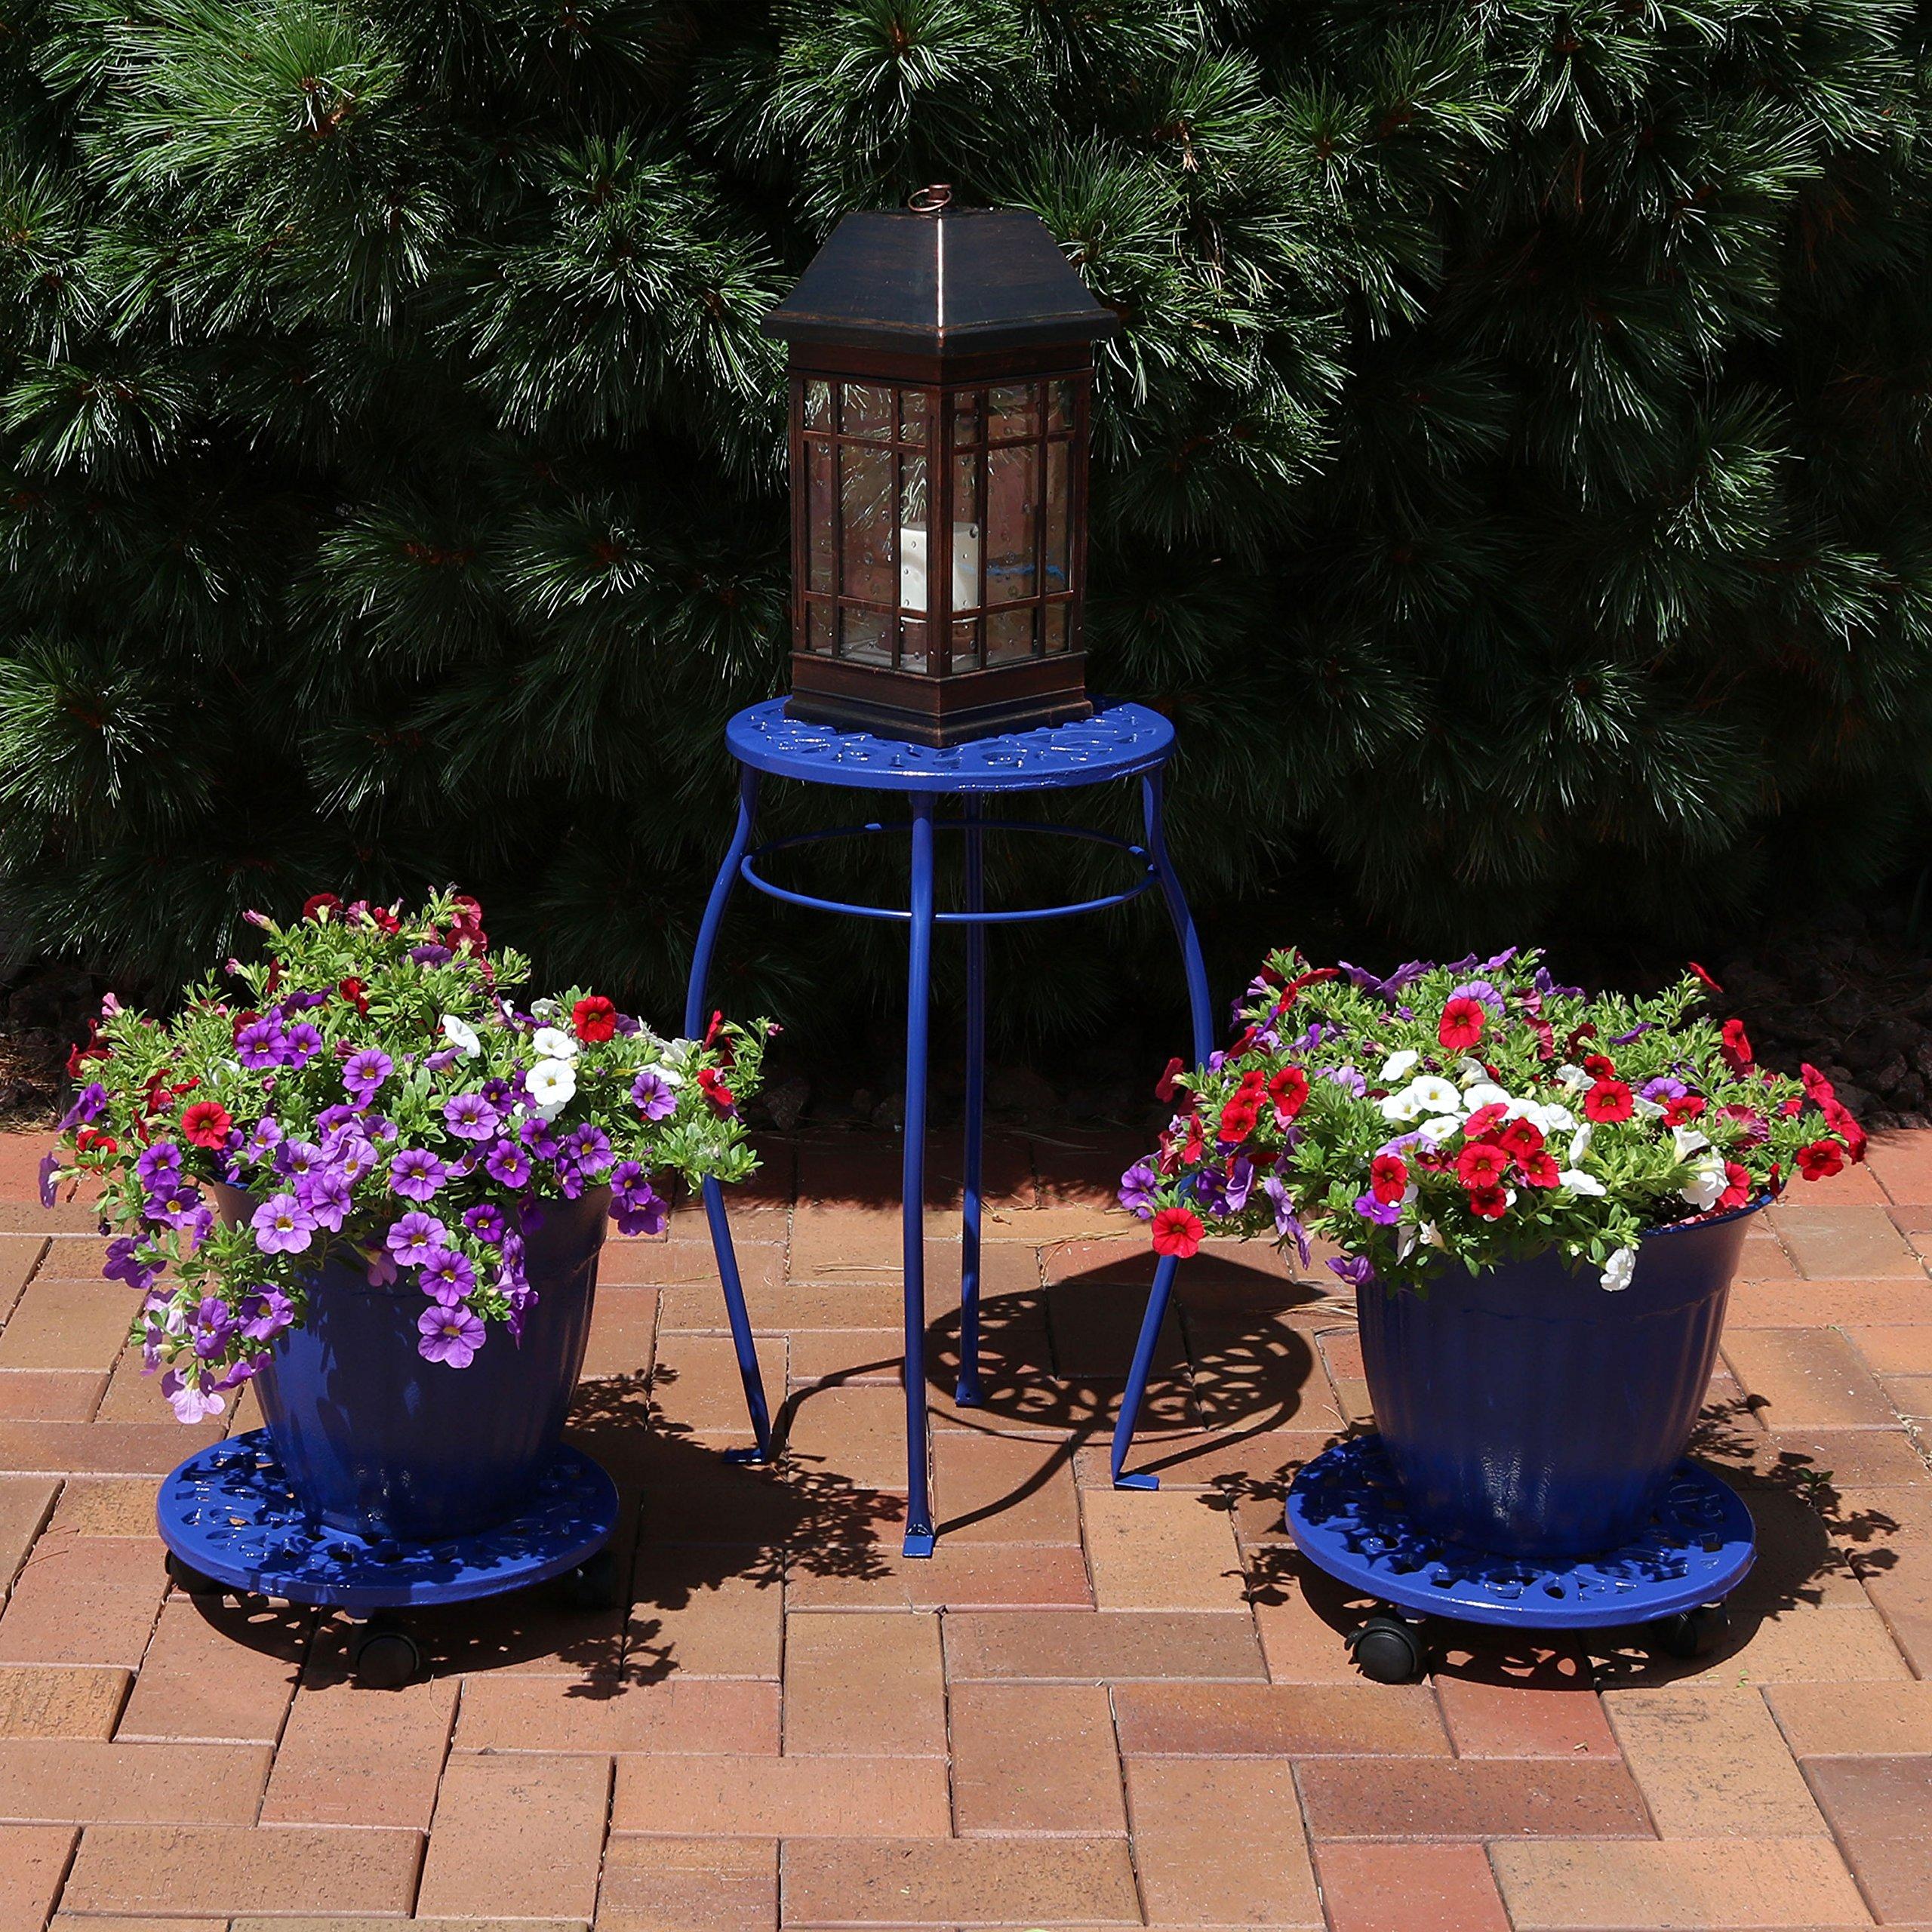 Sunnydaze 5-Piece Cast Iron Planter, Caddy and Plant Stand Set, Dark Blue by Sunnydaze Decor